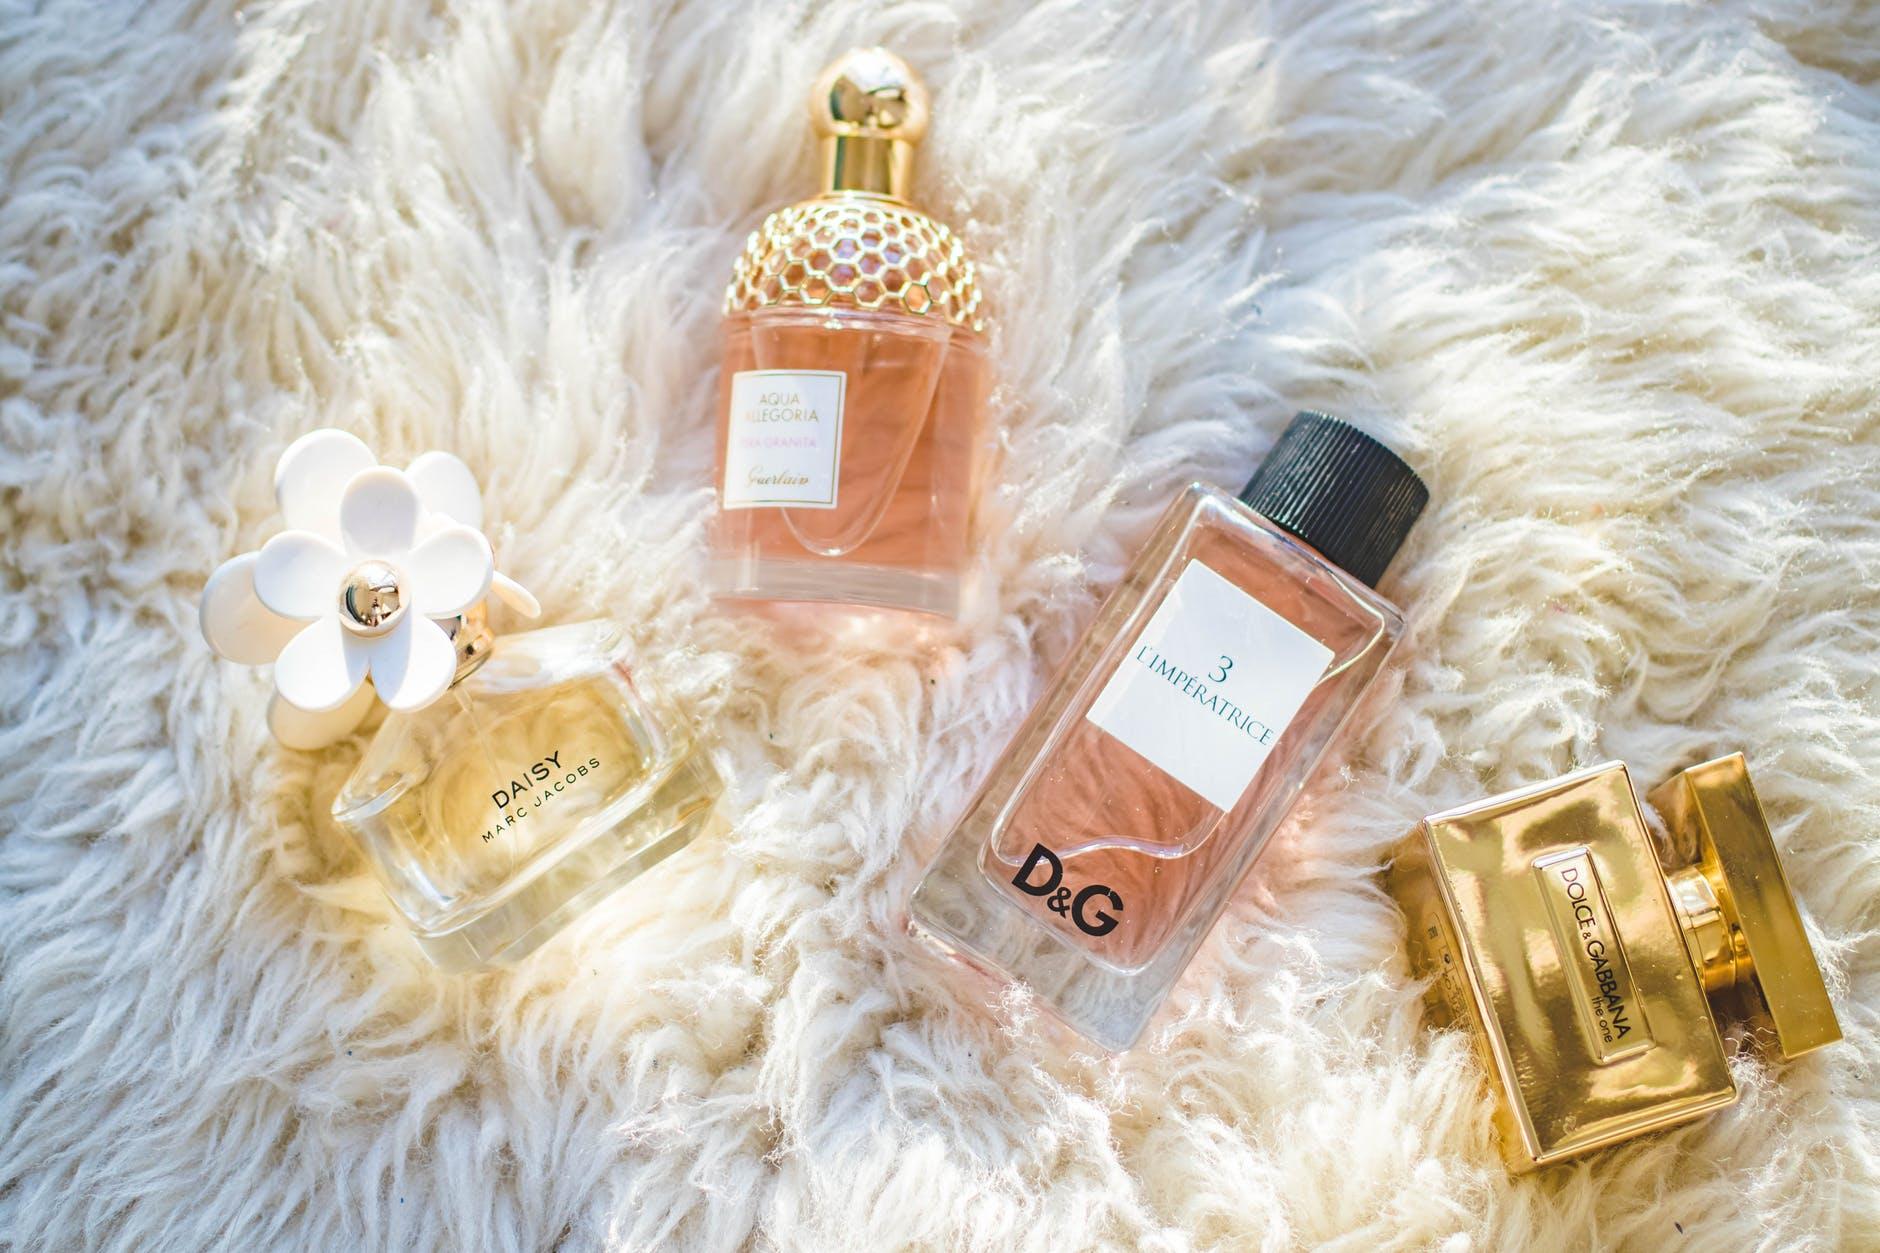 20 Best Long Lasting Perfume for Women in 2021